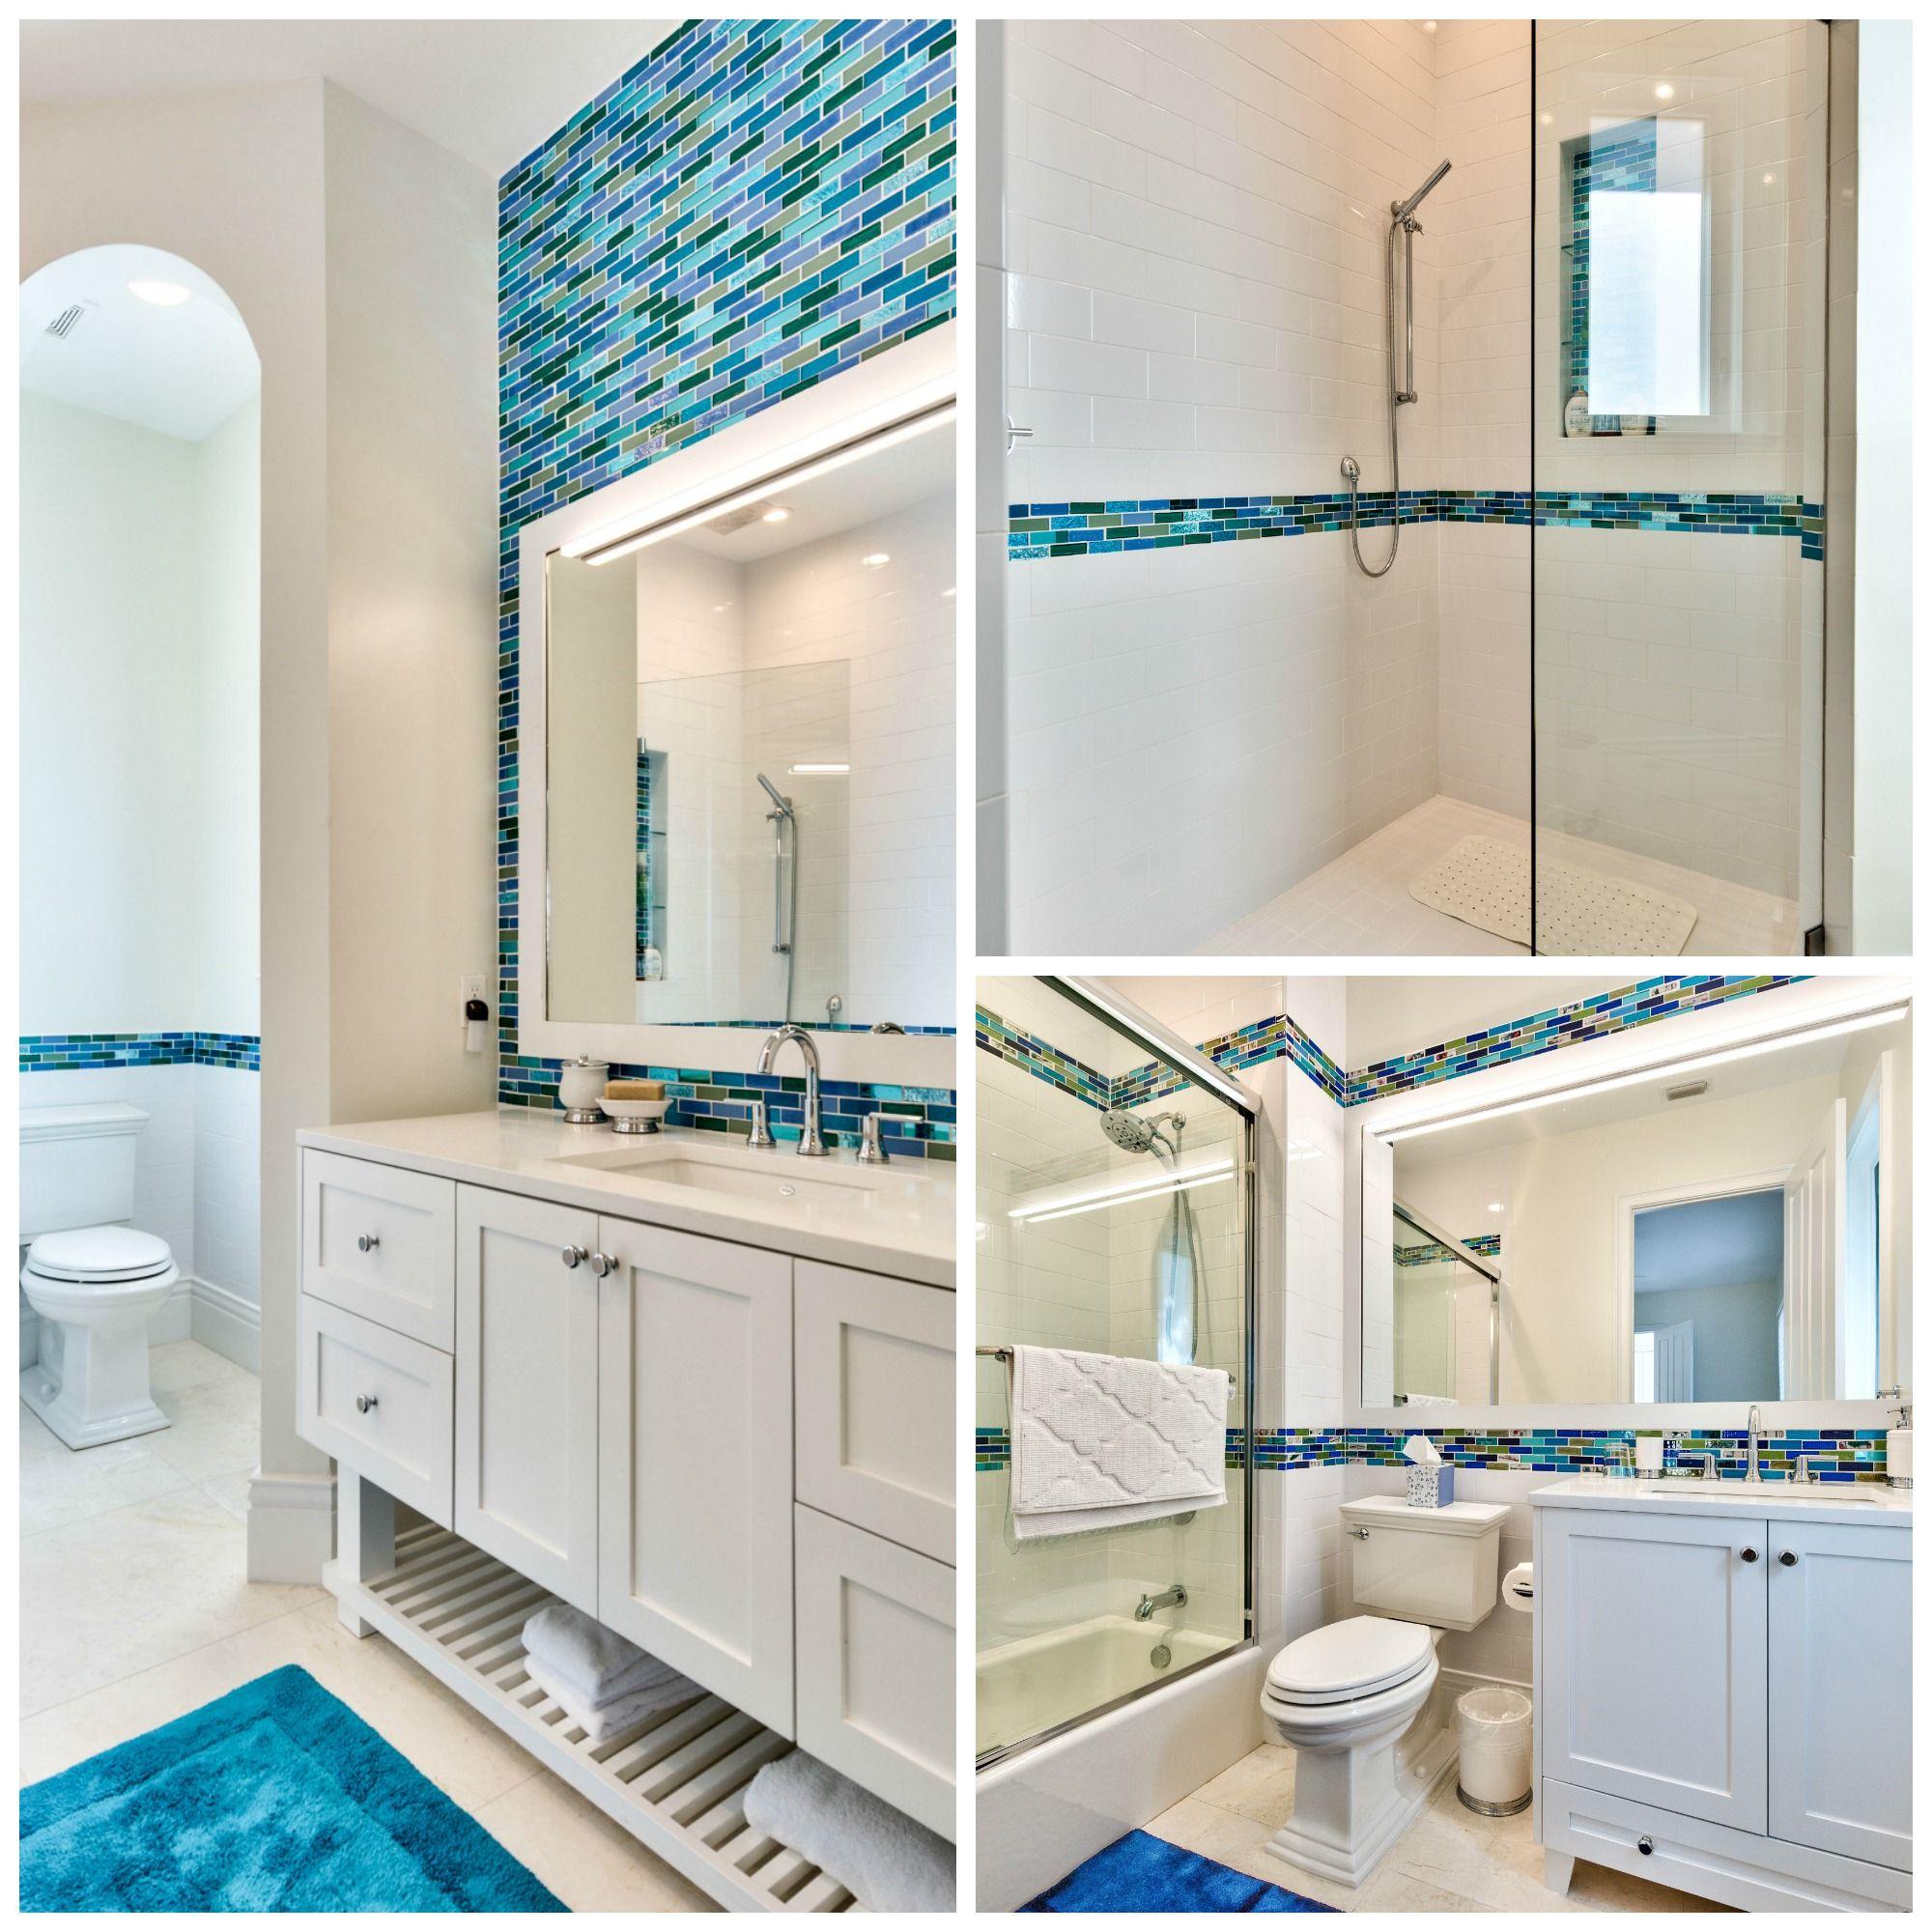 The Blue Tile Backsplash Along The Vanity Wall Bring The Serenity Of The Ocean Inside Naplesflorida B Blue Backsplash Blue Tile Backsplash Bathrooms Remodel [ 2000 x 2000 Pixel ]